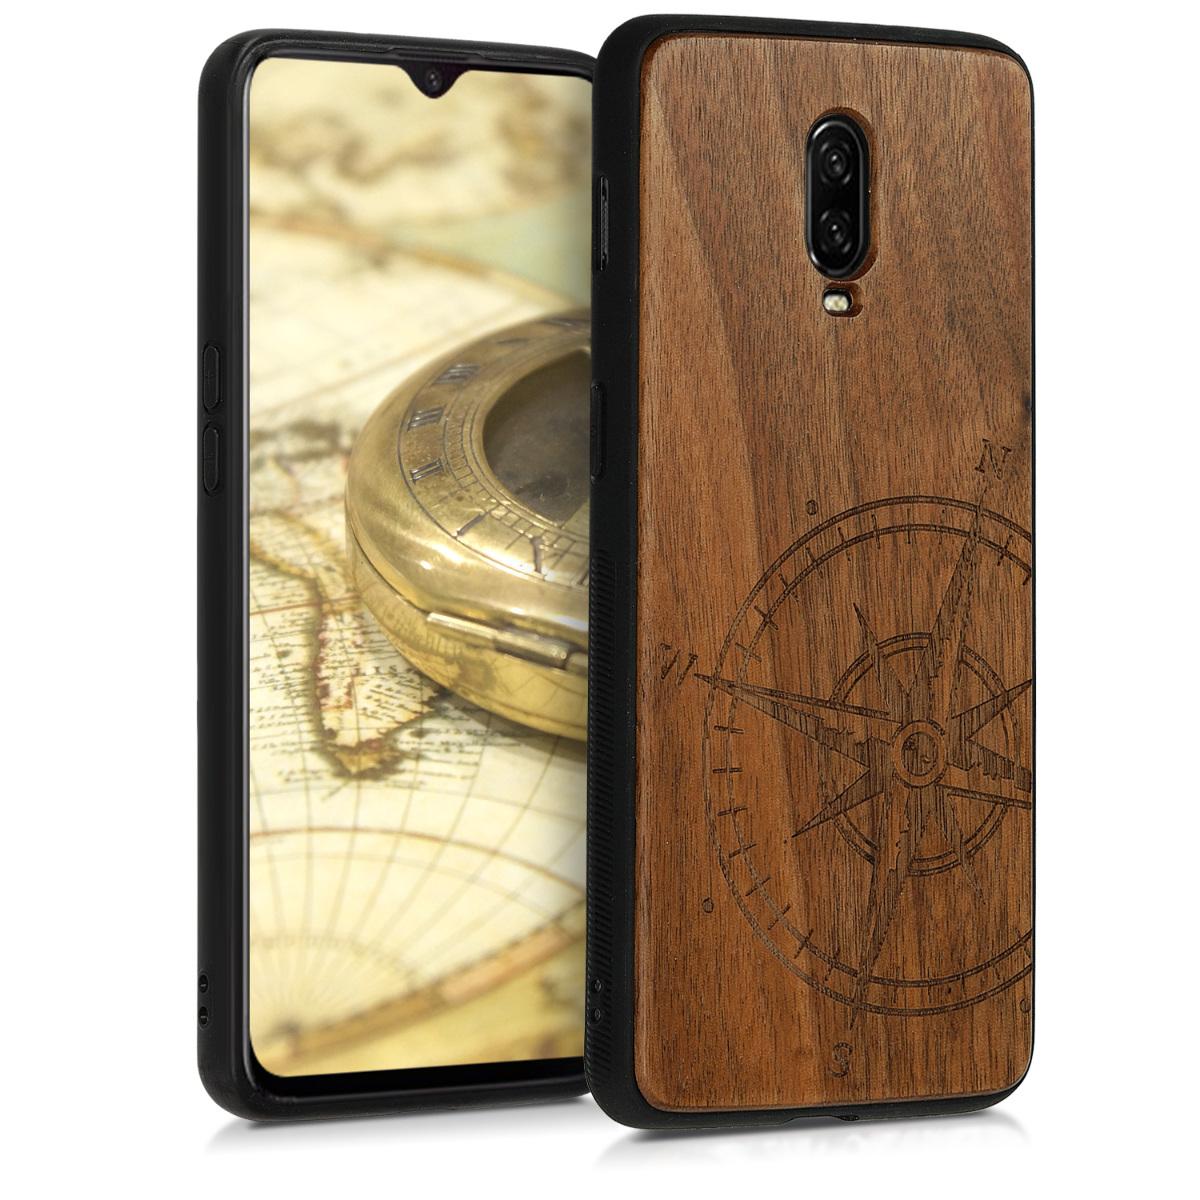 KW Ξύλινη Θήκη OnePlus 6T - Navigational Compass (46663.01)